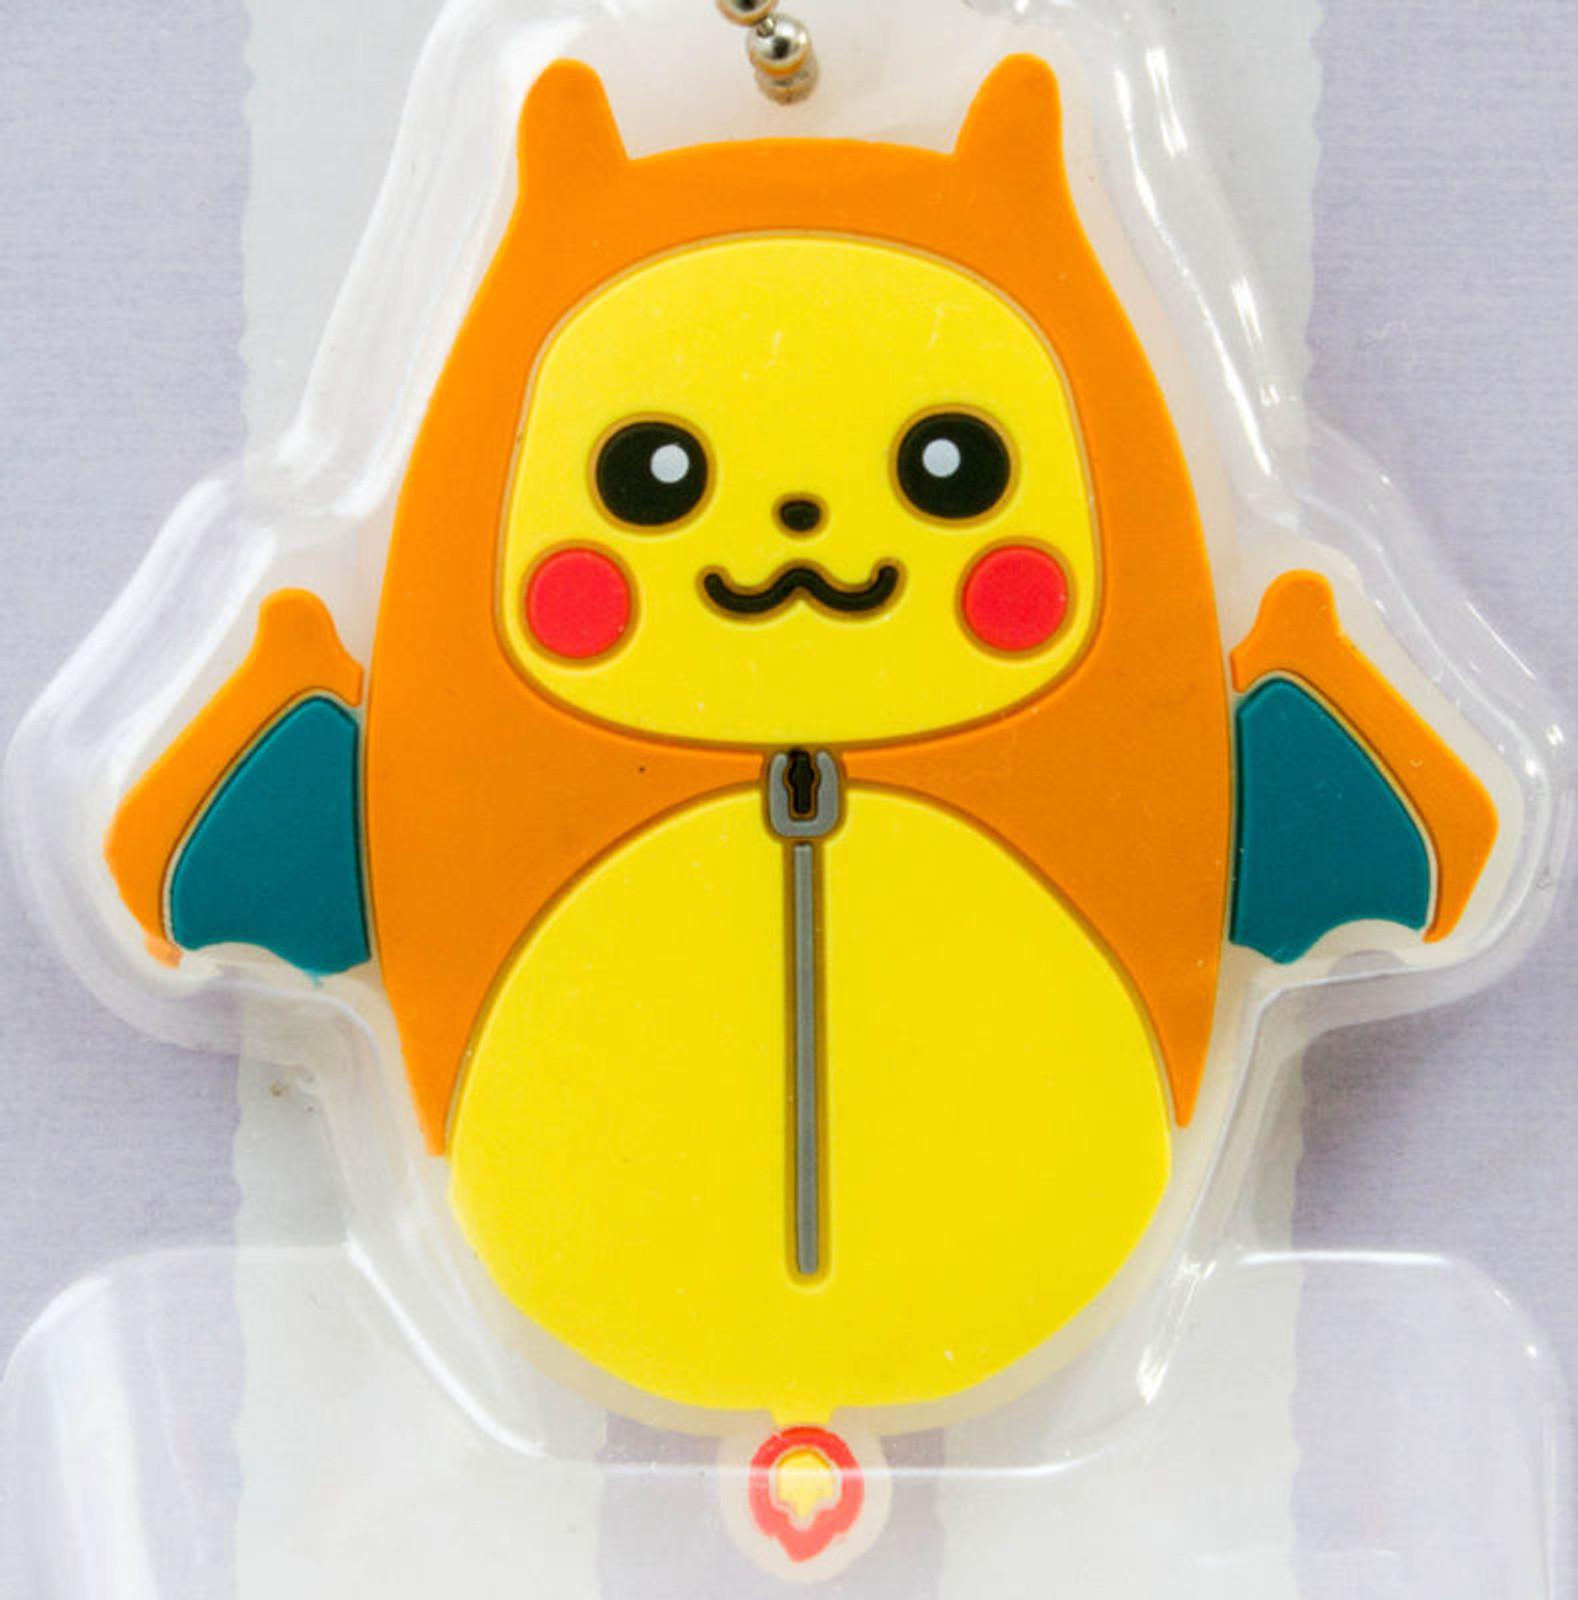 Pokemon Pikachu Nebukuro Sleeping Bag Mascot Rubber Ball Chain JAPAN ANIME MANGA